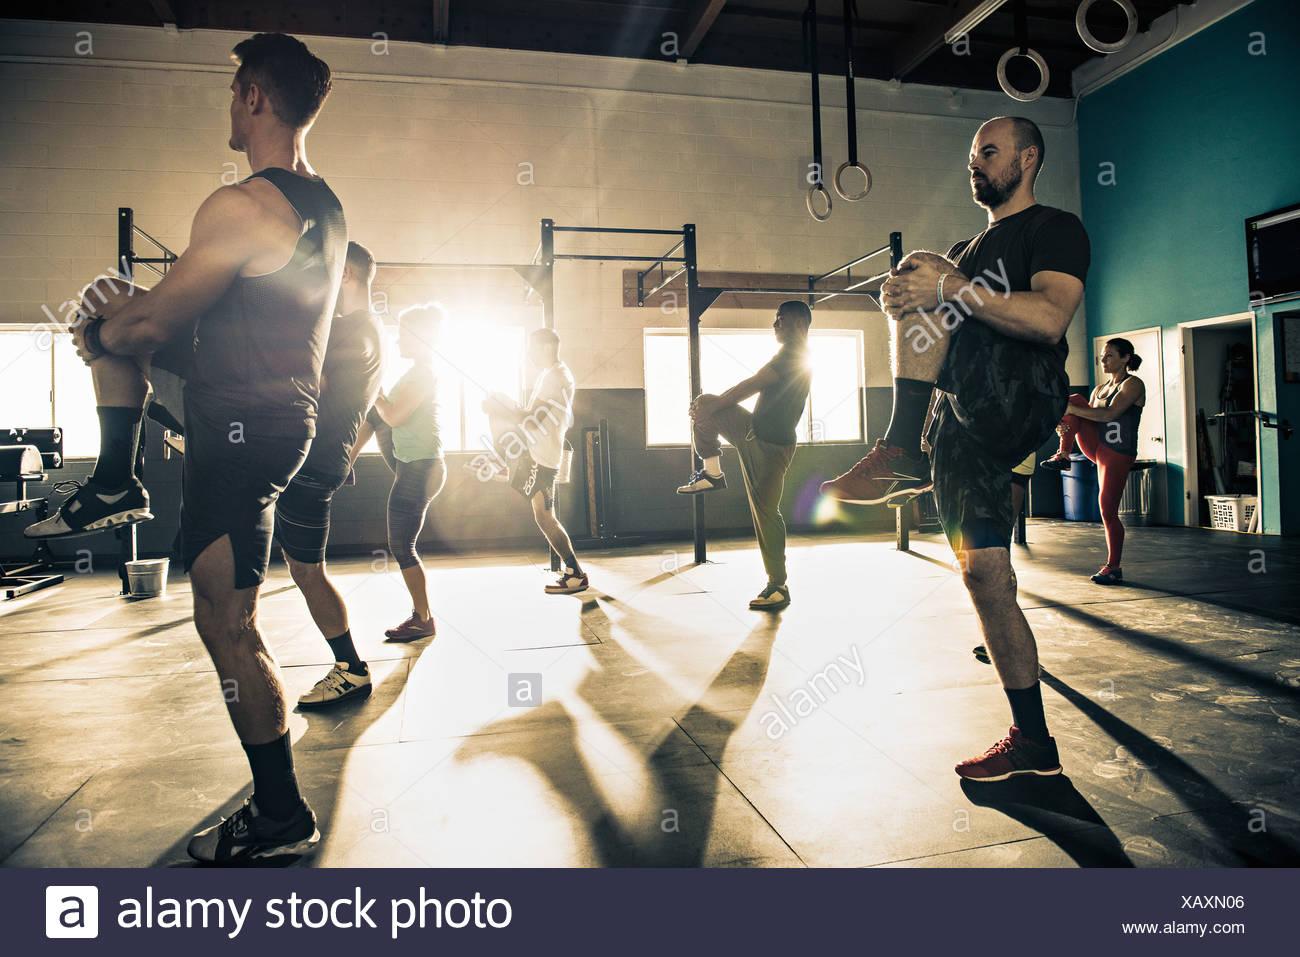 Groupe de remise en forme formation ensemble in gymnasium Photo Stock